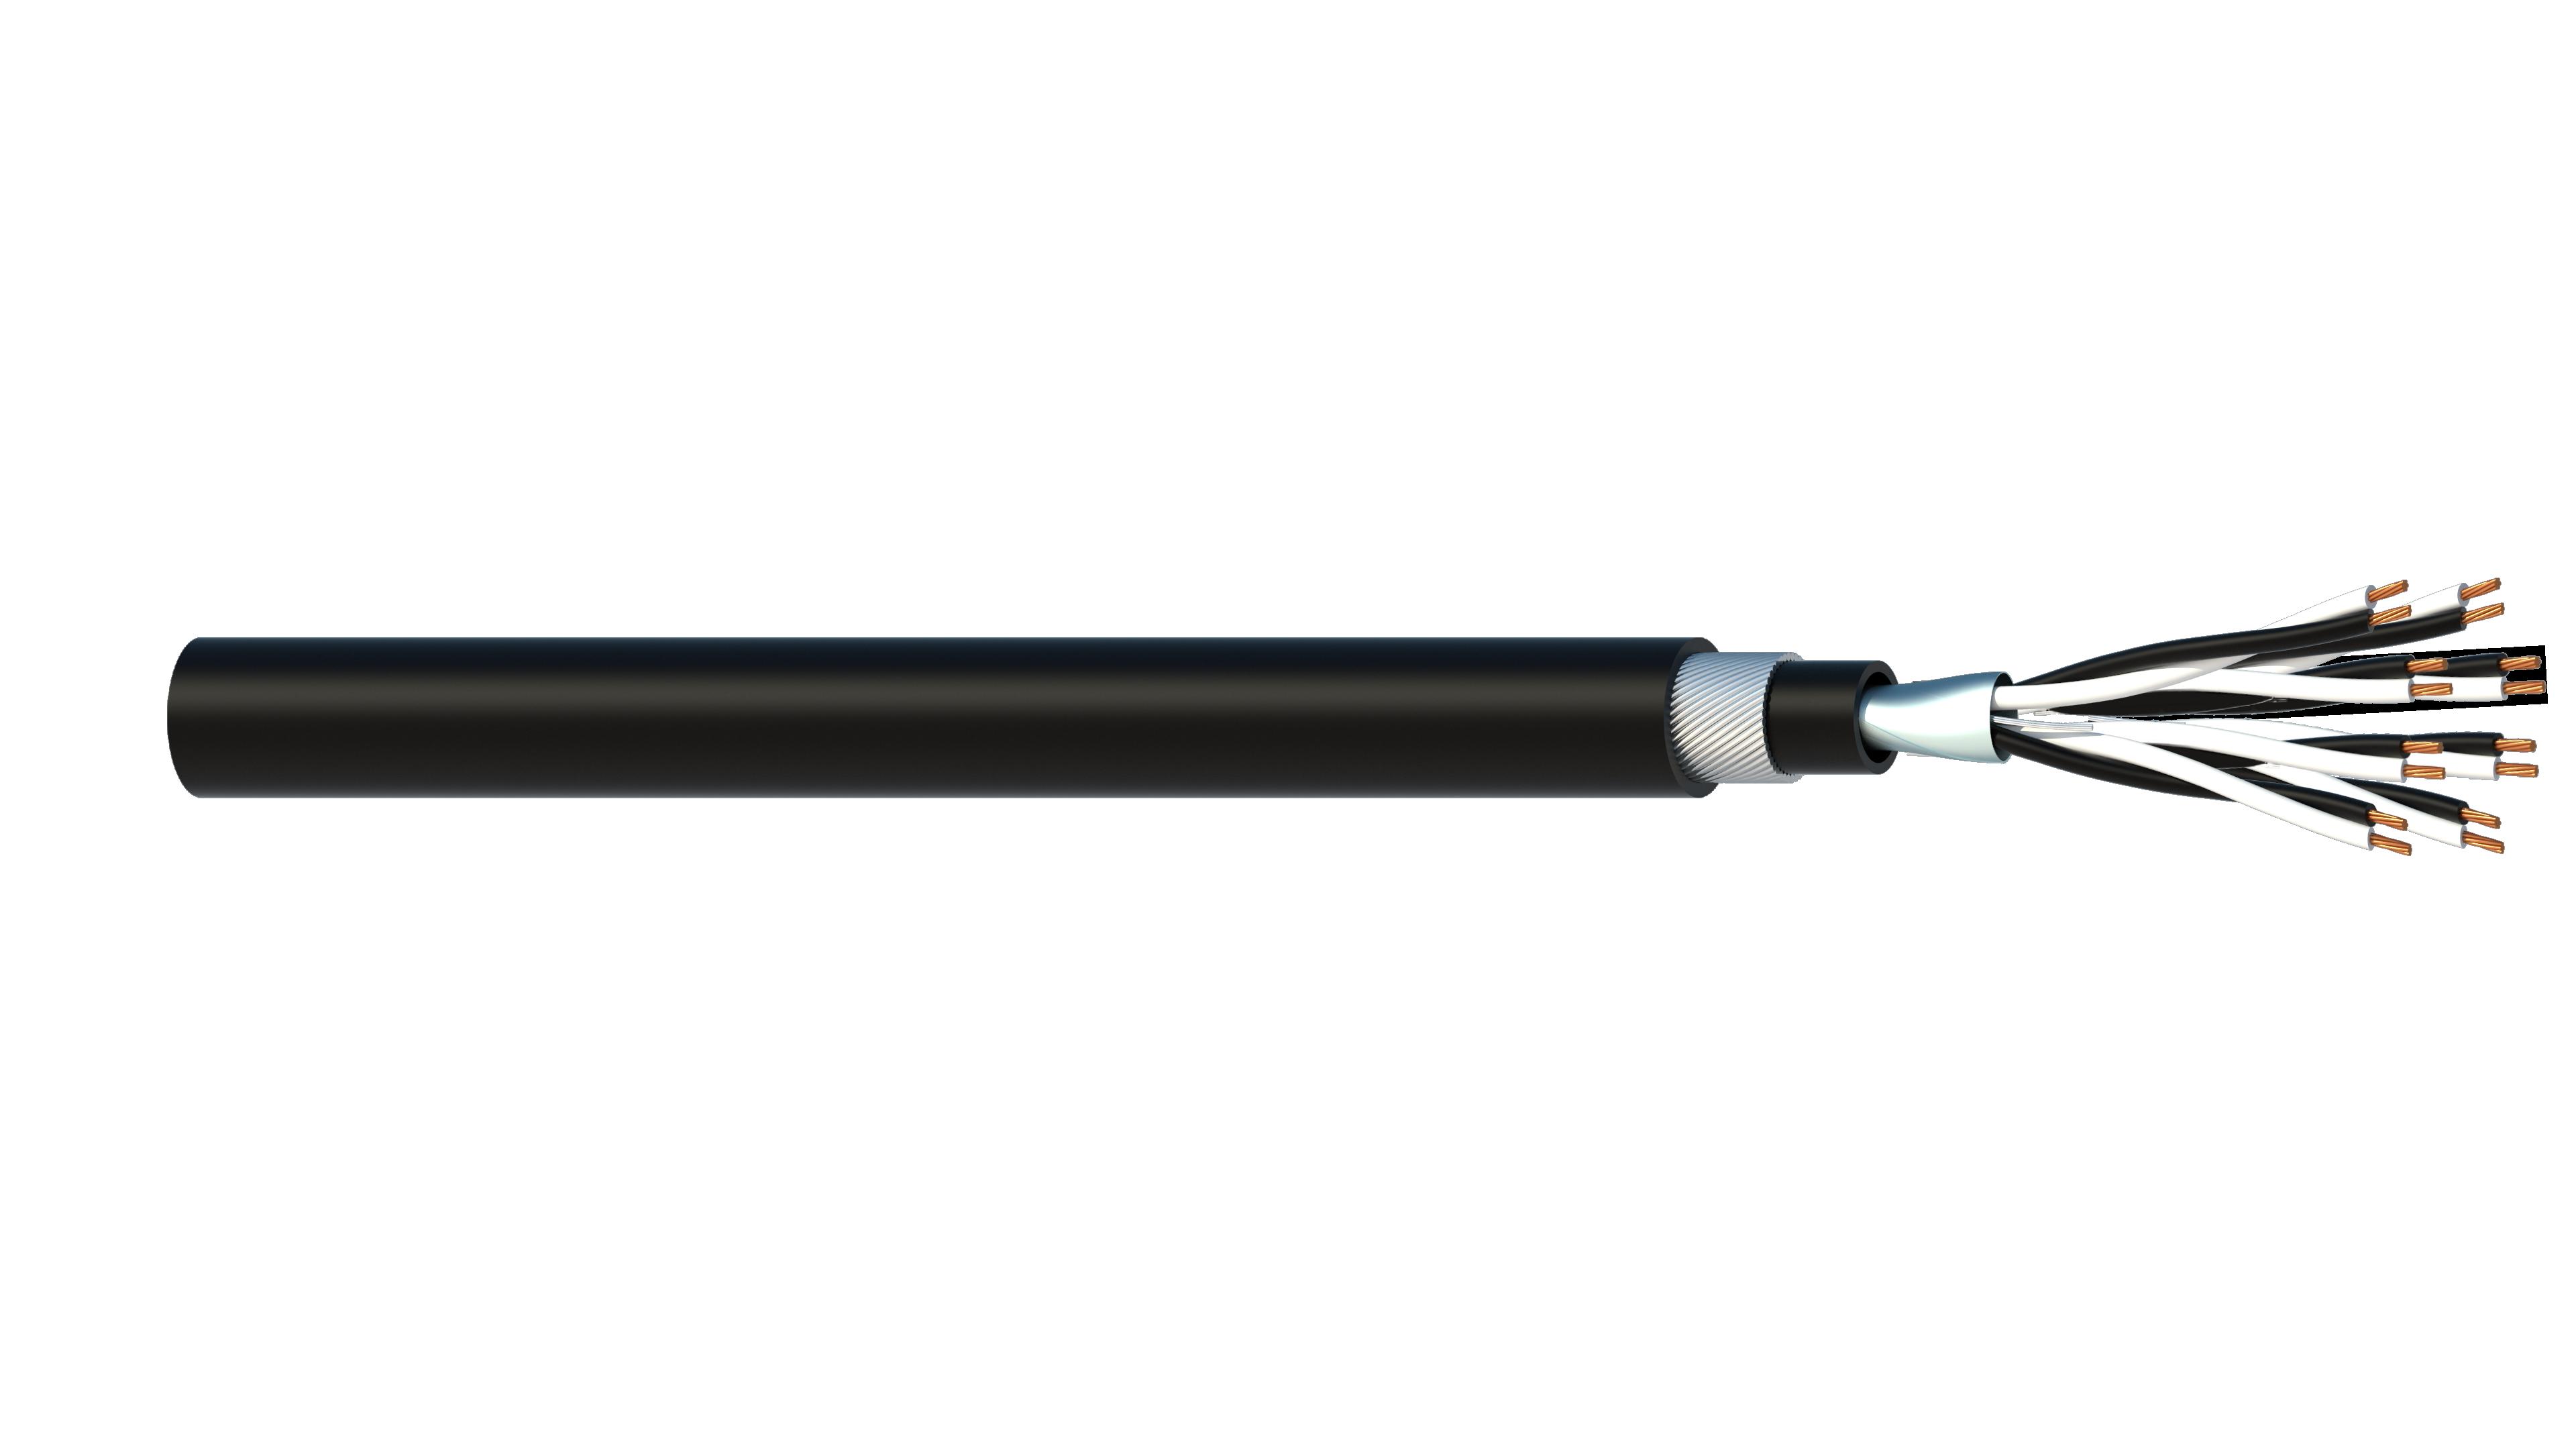 8 Pair 1.5mm2 Cu/PVC/OS/PVC/SWA/PVC Maser Instrumentation Cable - Black Sheath